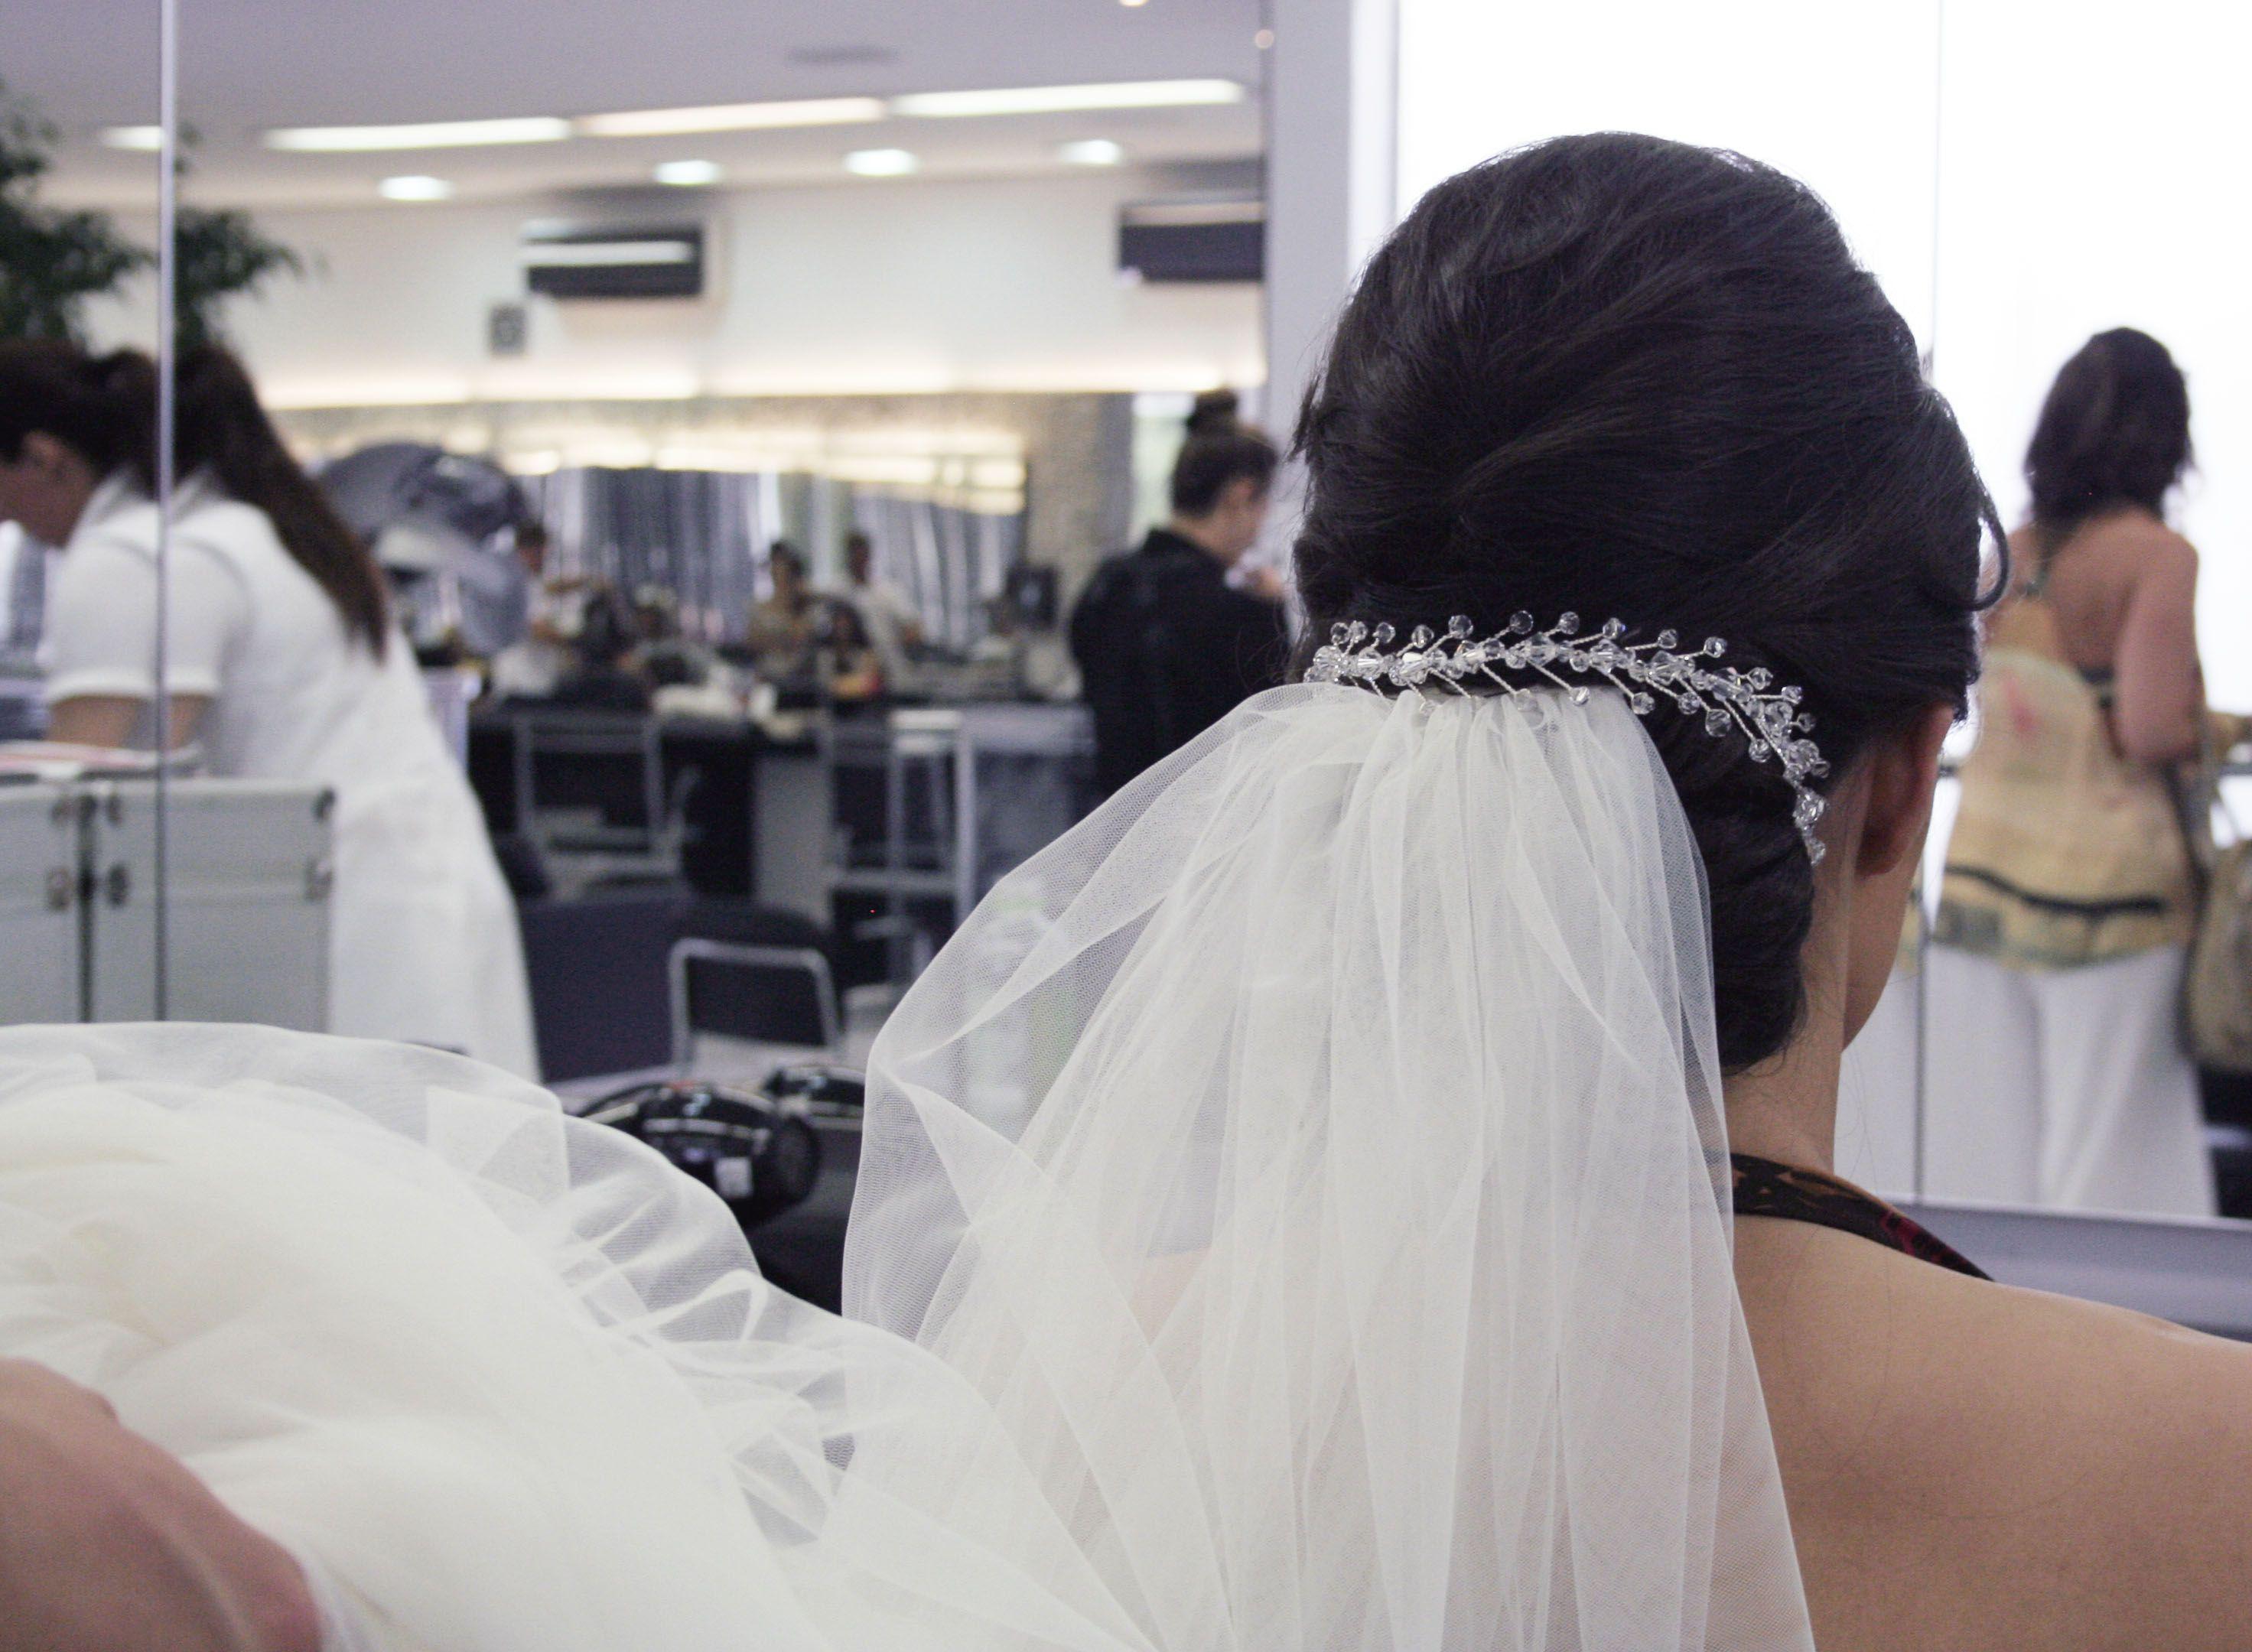 Dia da Noiva Naiara Carris que casou dia 22/01/2014. #casamento #wedding #penteadonoiva #torritontaunay #welovebeauty